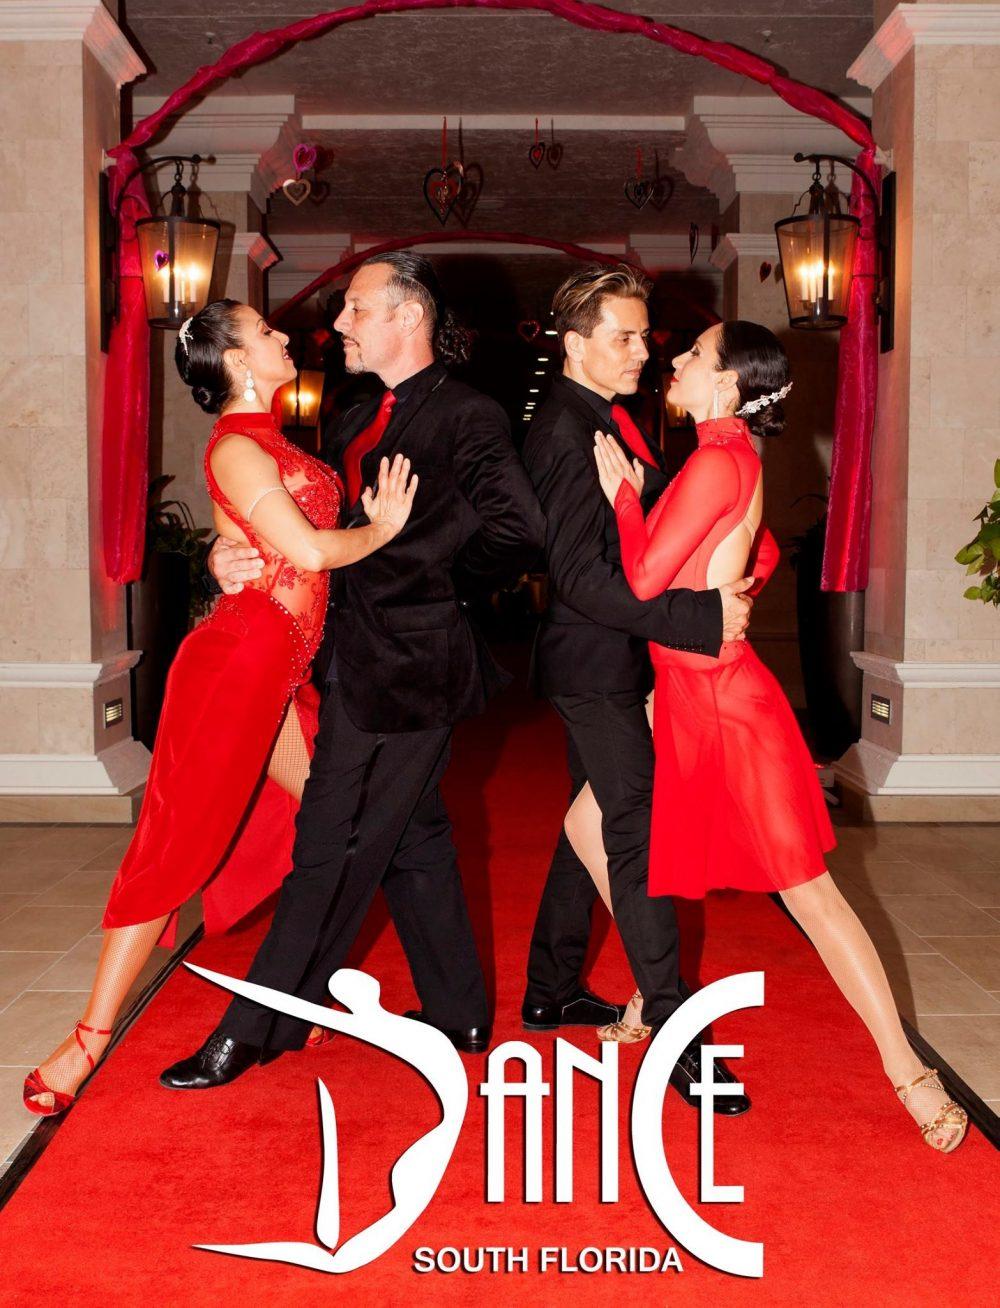 Tango Dancers Miami Professional Dancers for Hire - Dance